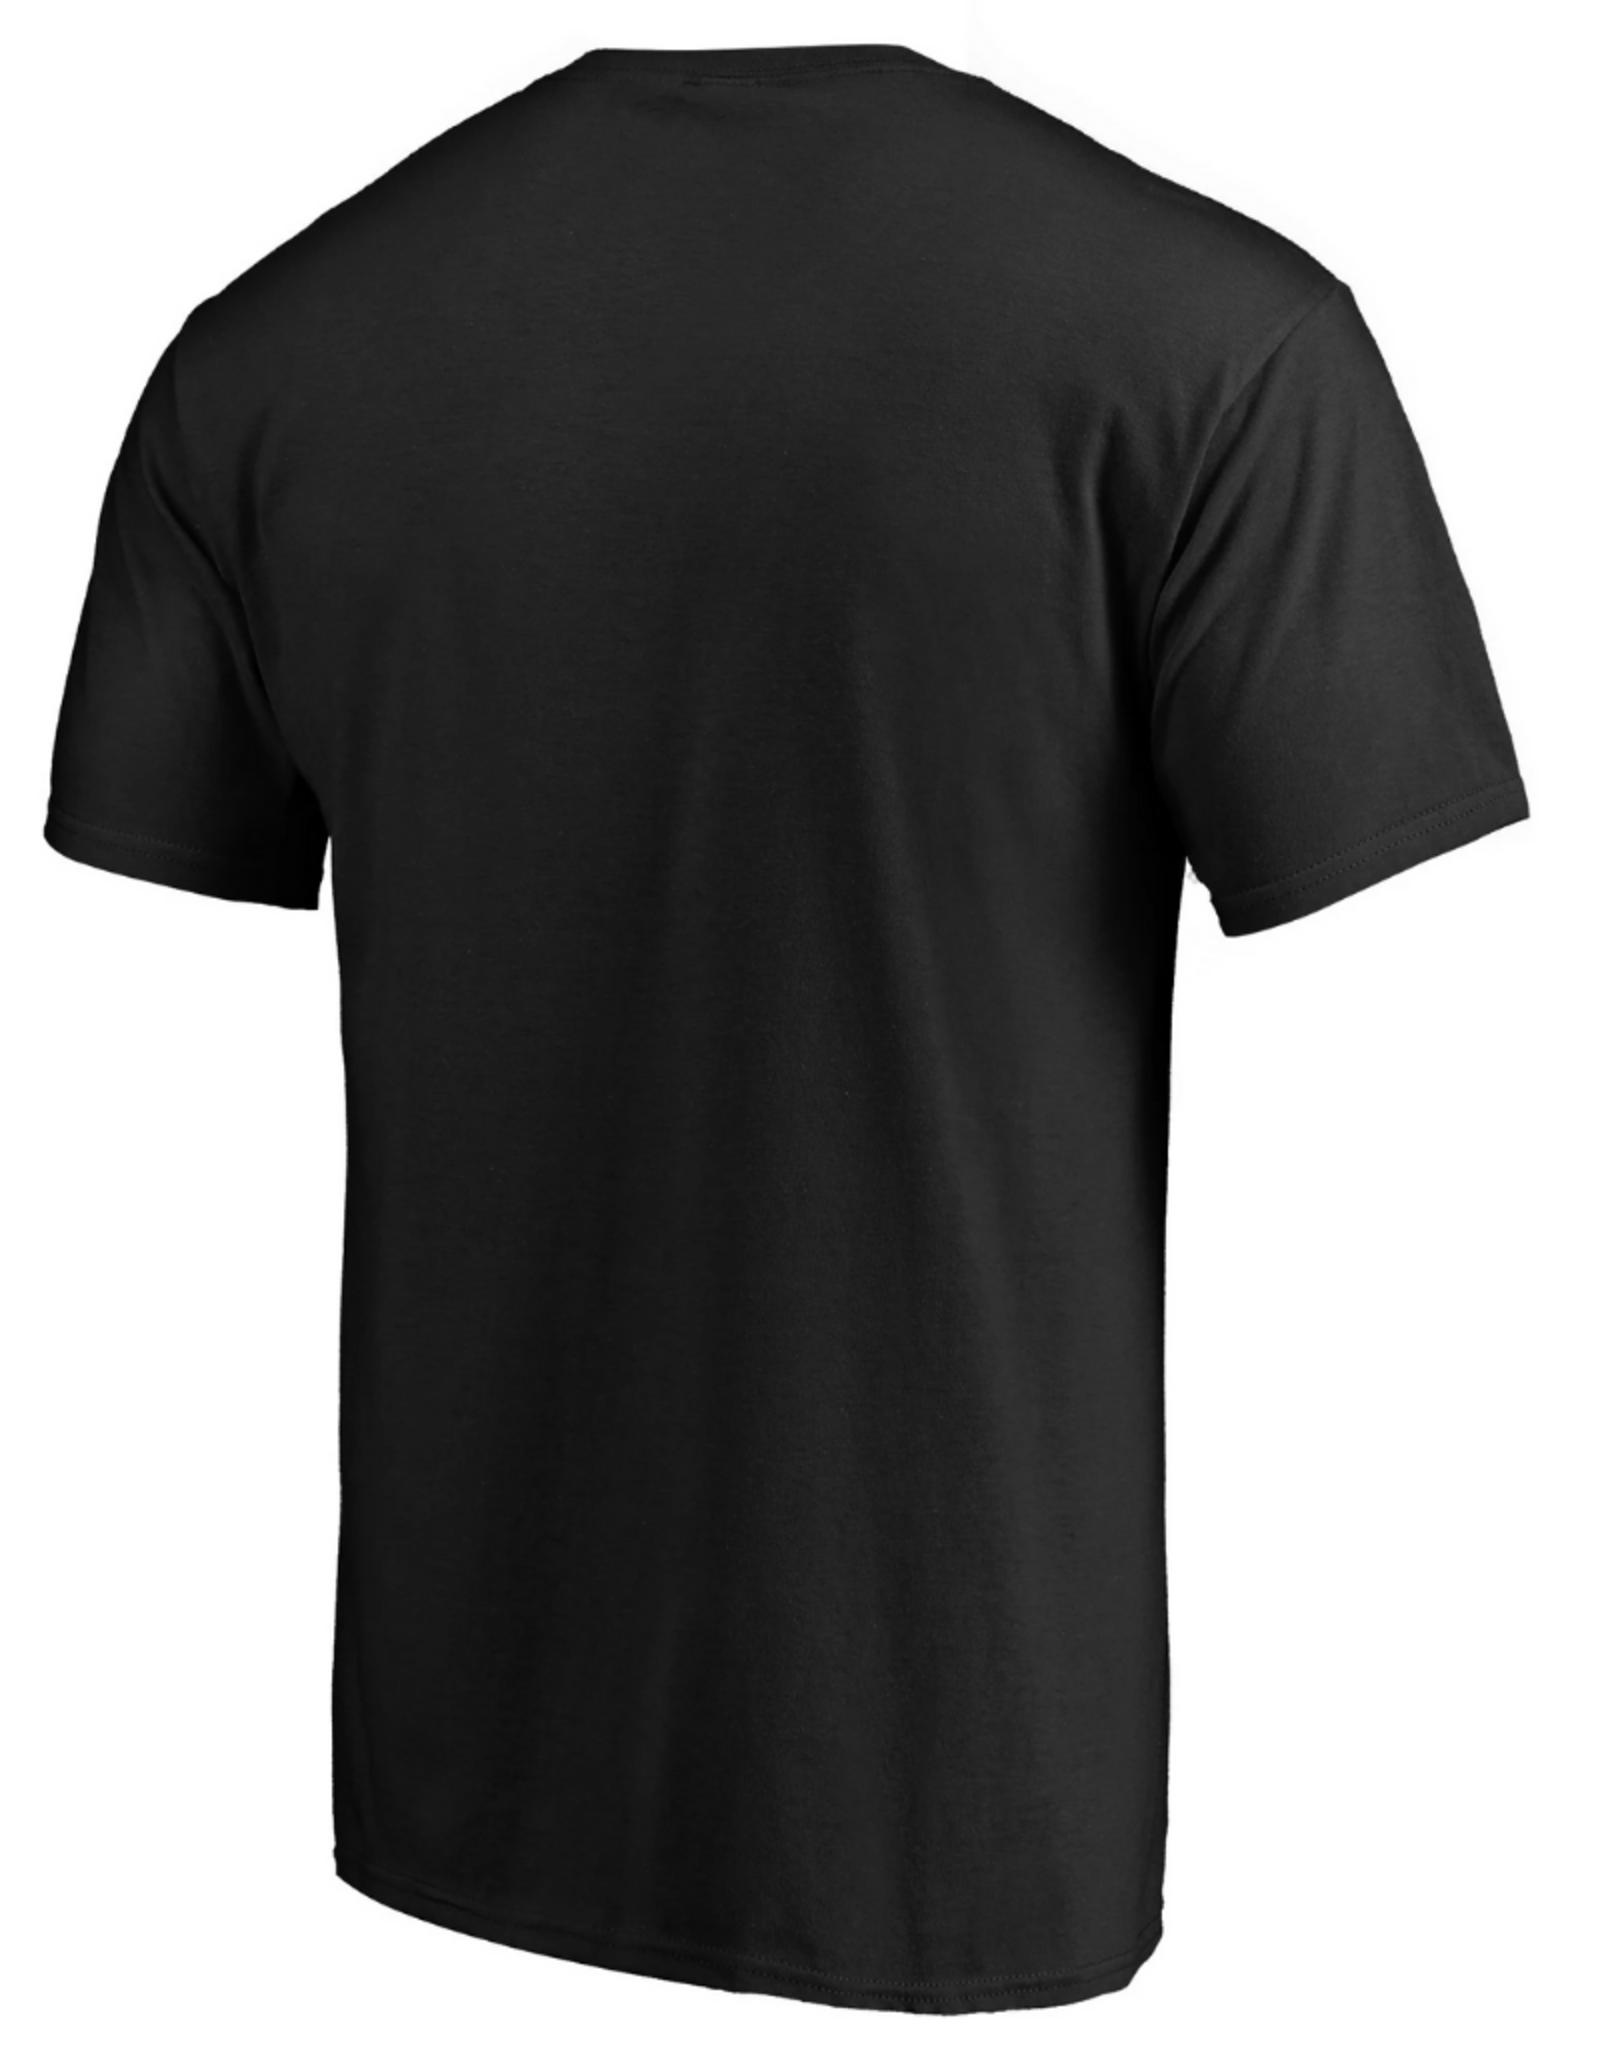 Fanatics Fanatics Men's Circle Start T-Shirt Philadelphia Flyers Black